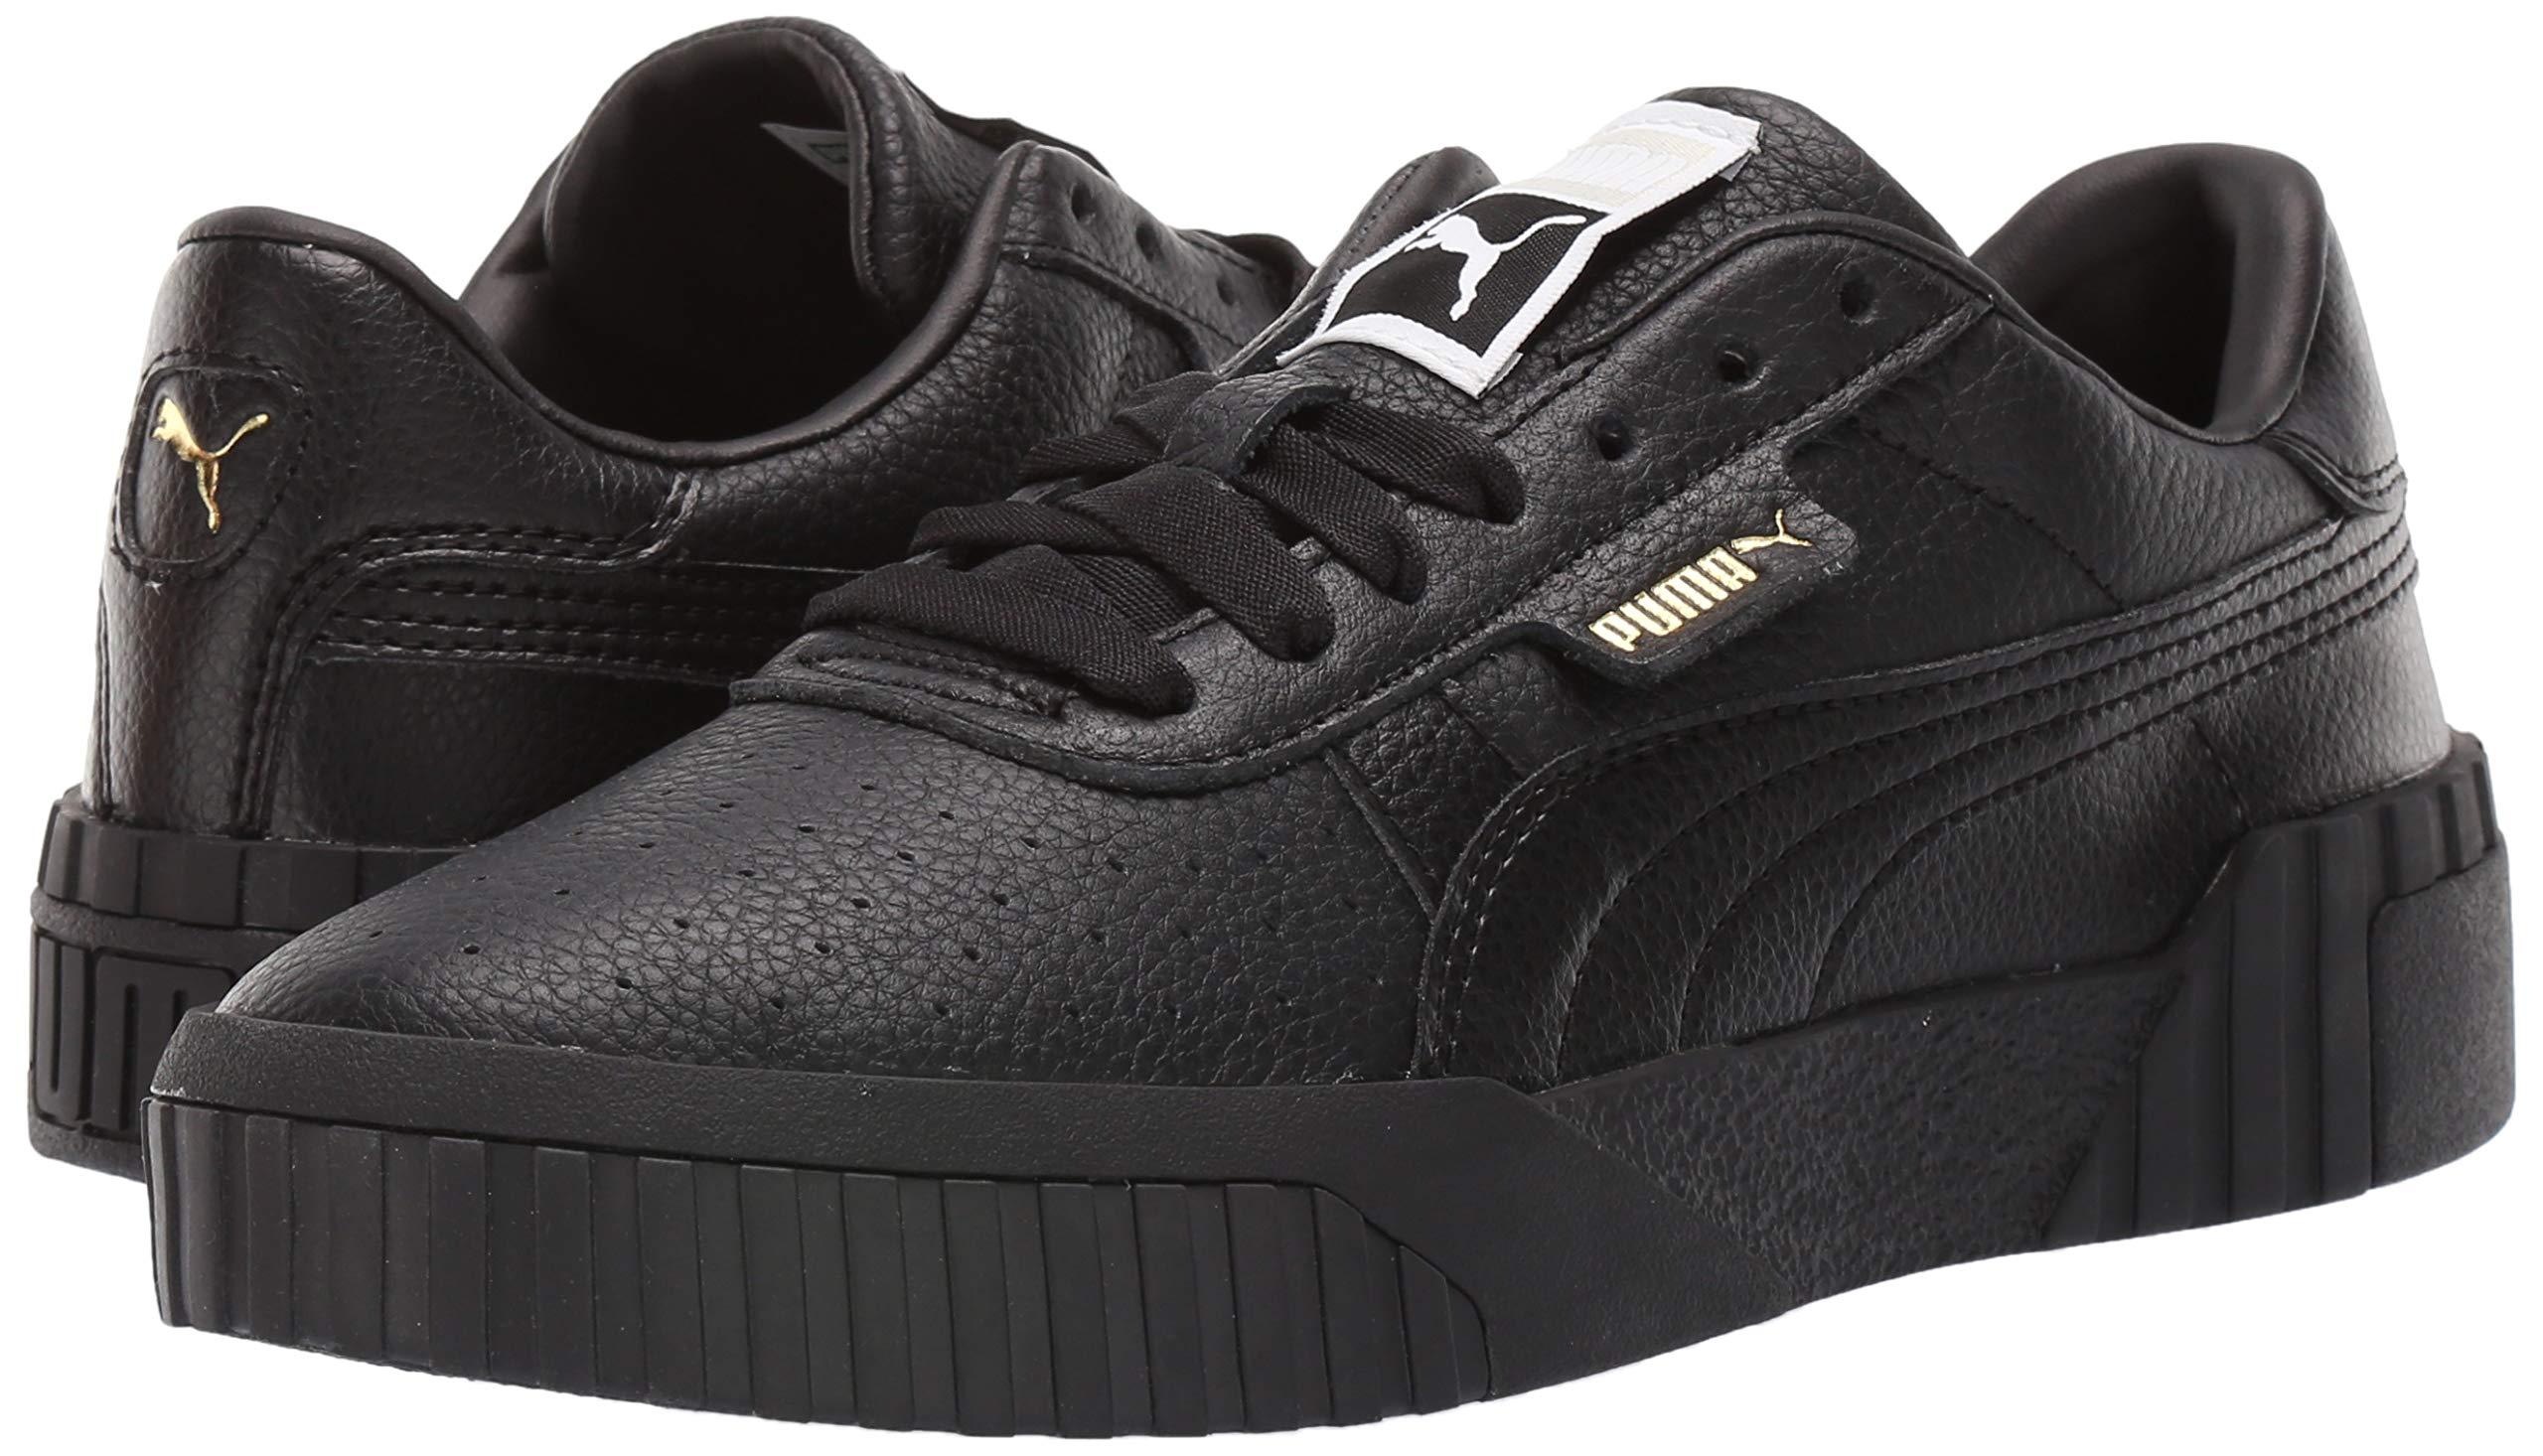 Details about PUMA Women's Cali Sneaker, Puma Black-Puma Black , - Choose  SZ/color